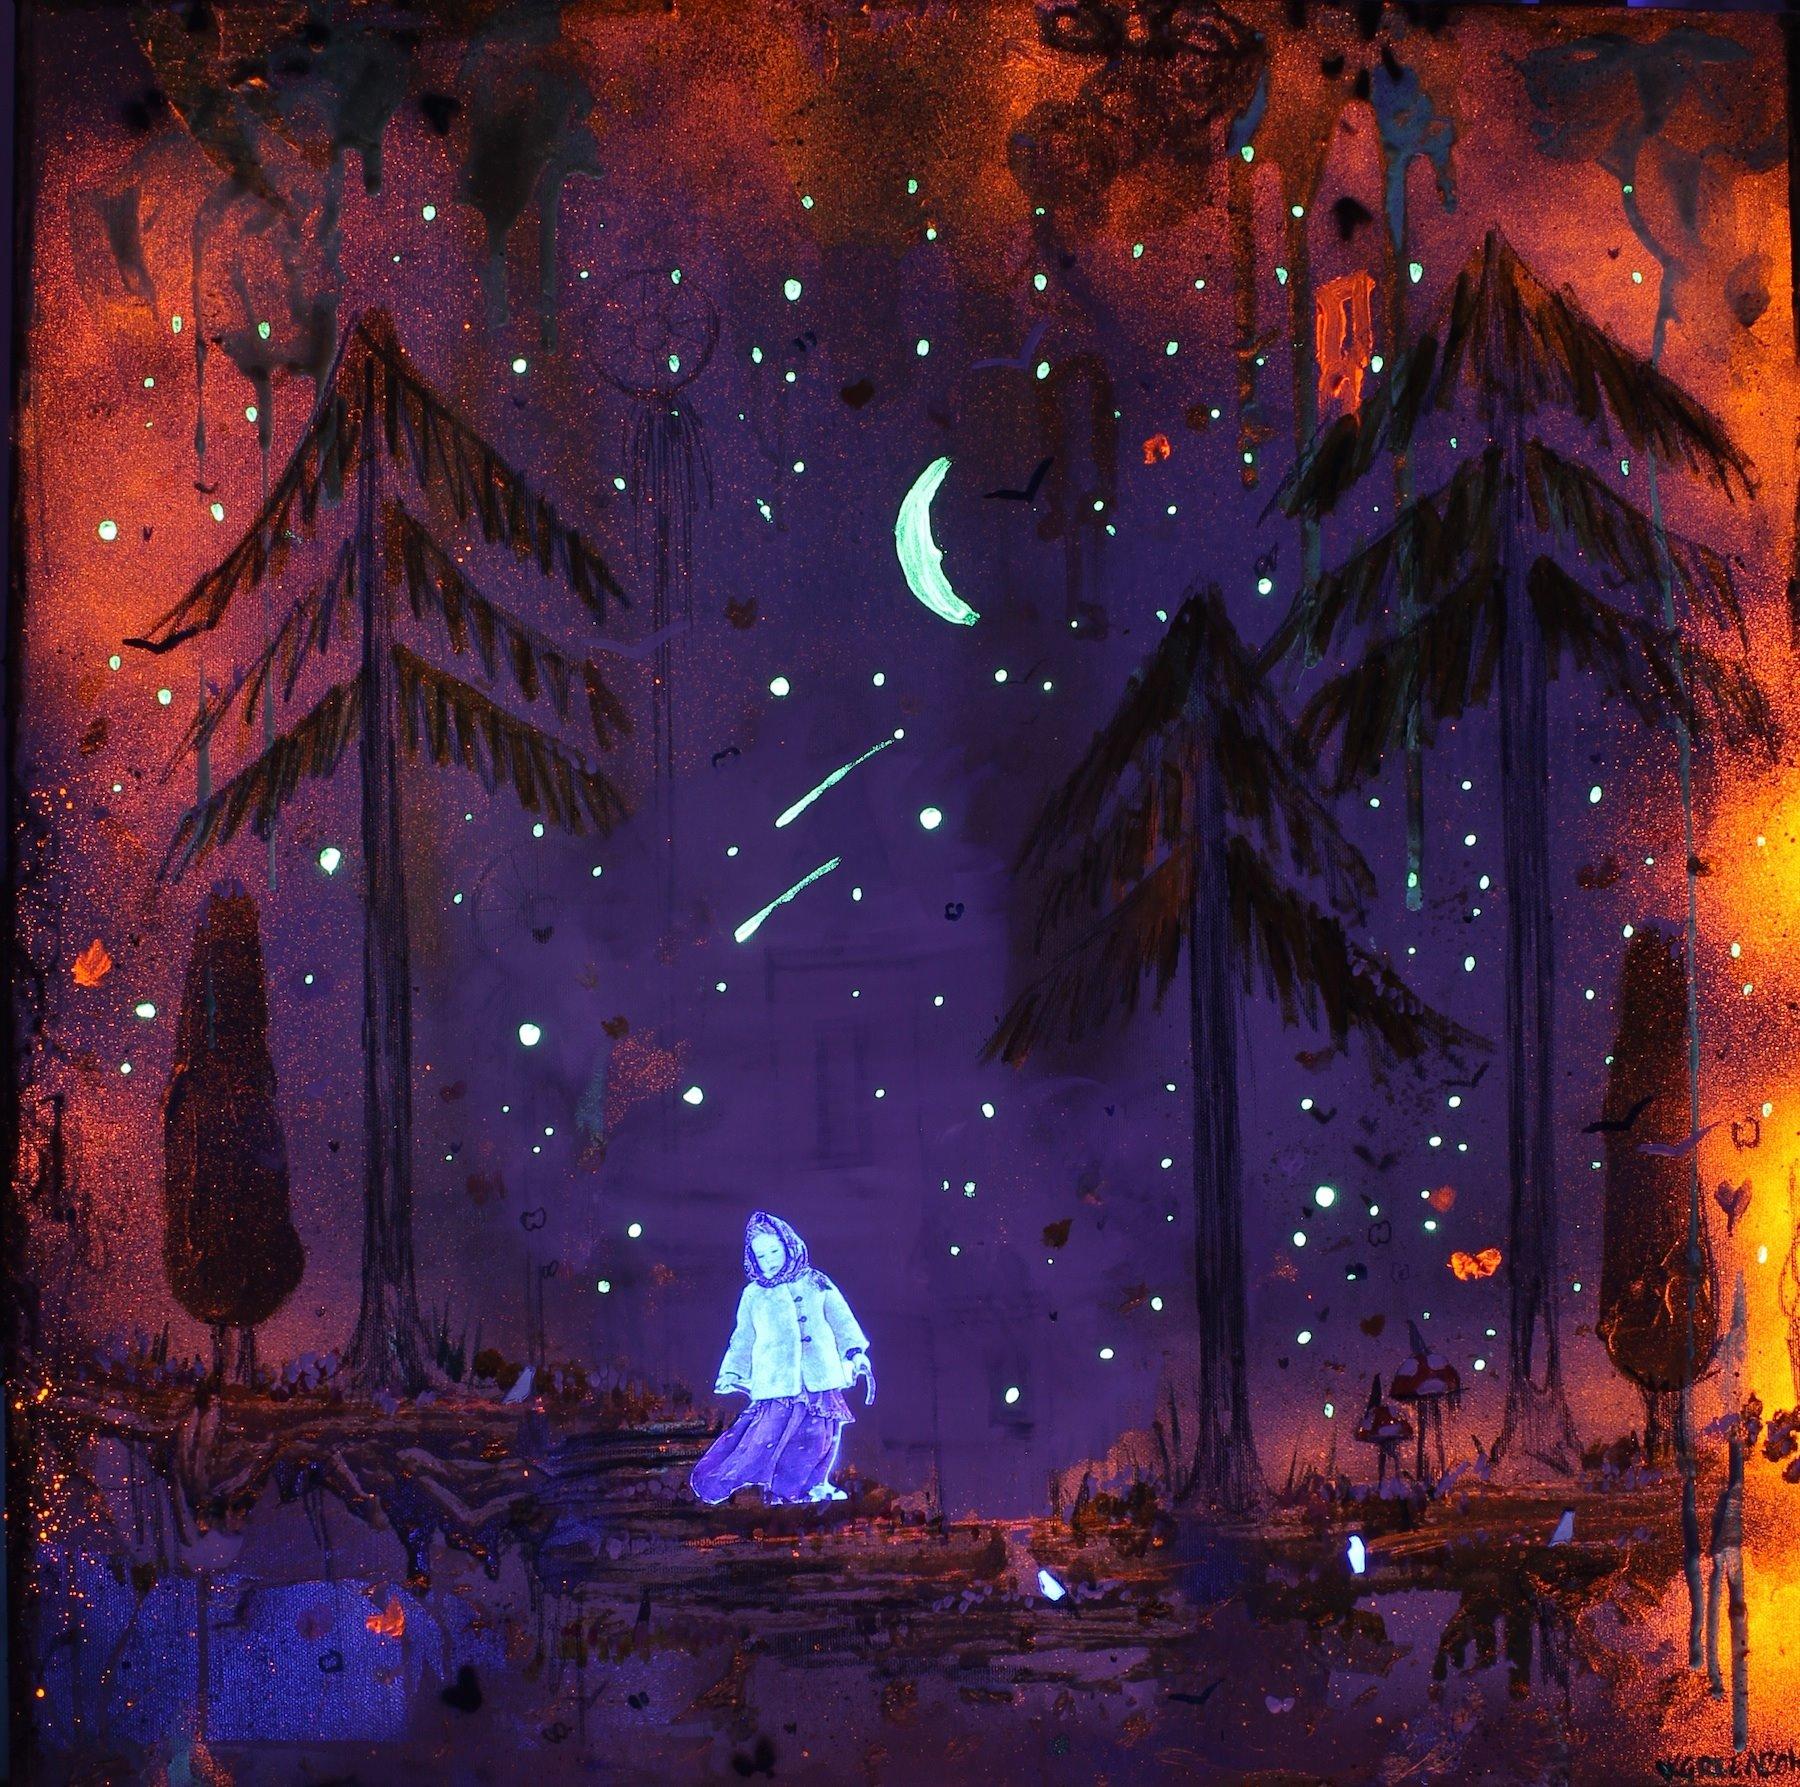 Forest Snow - under UV light